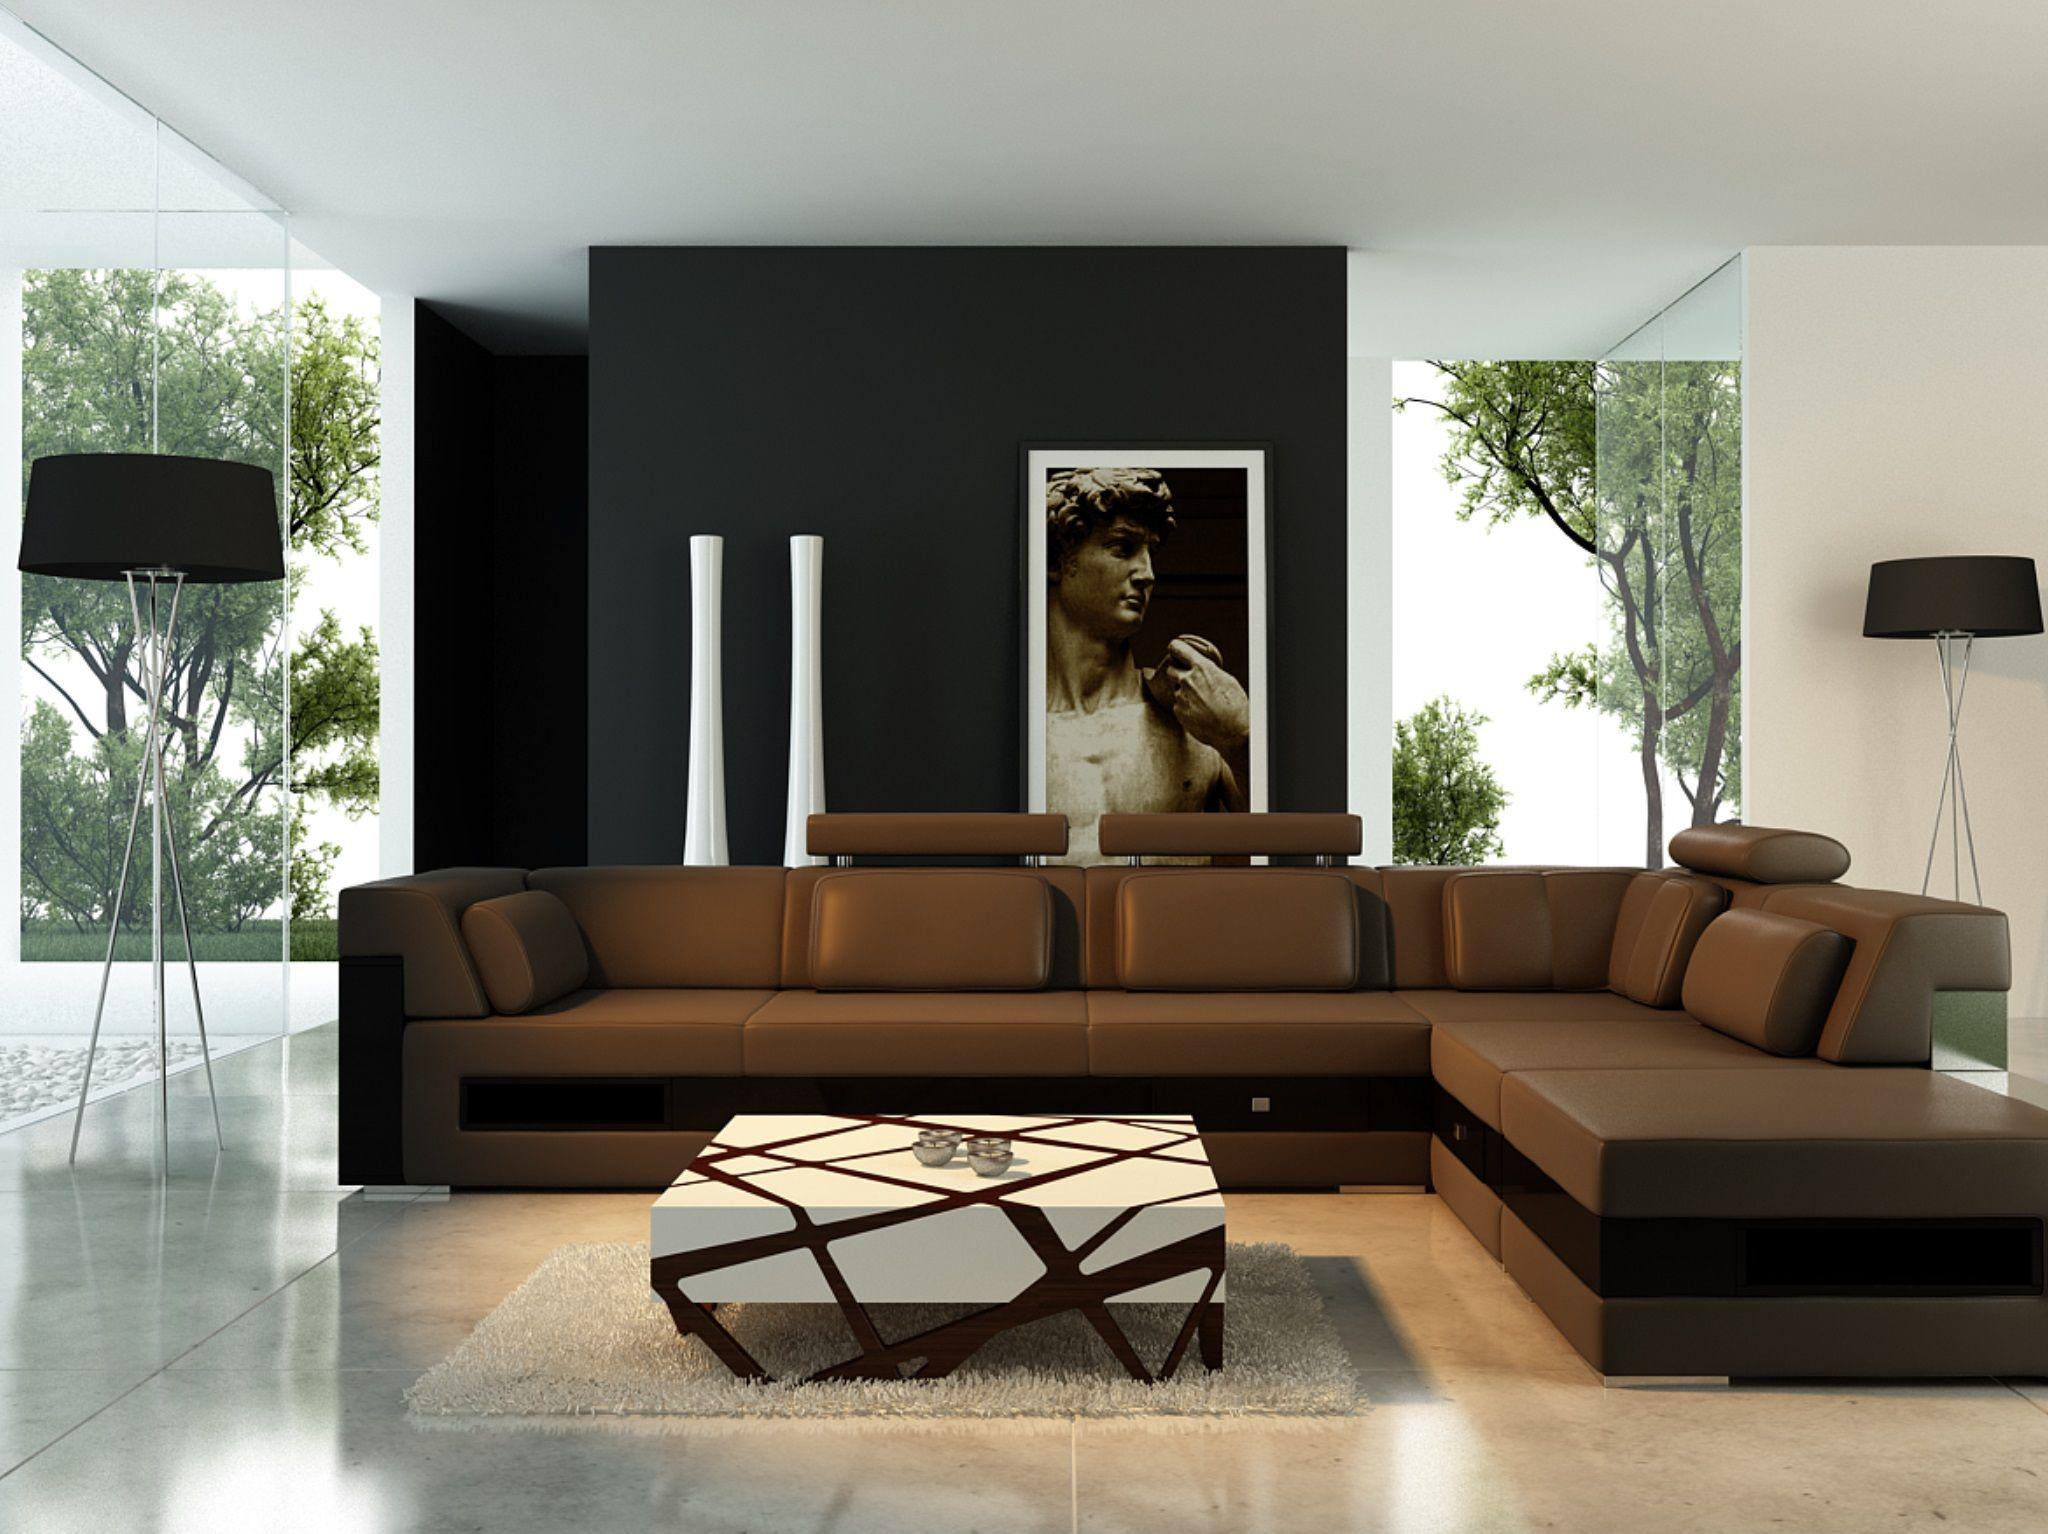 Luxury Living Room | | Meet our modern furniture: Roots Coffee Table #livingroomideas #livingroomdesign #furniture #luxuryfurniture #interiordesign #interiordecor #homedecor #decoration #designideas #livingroomdecor #coffeetableideas #coffeetabledesign